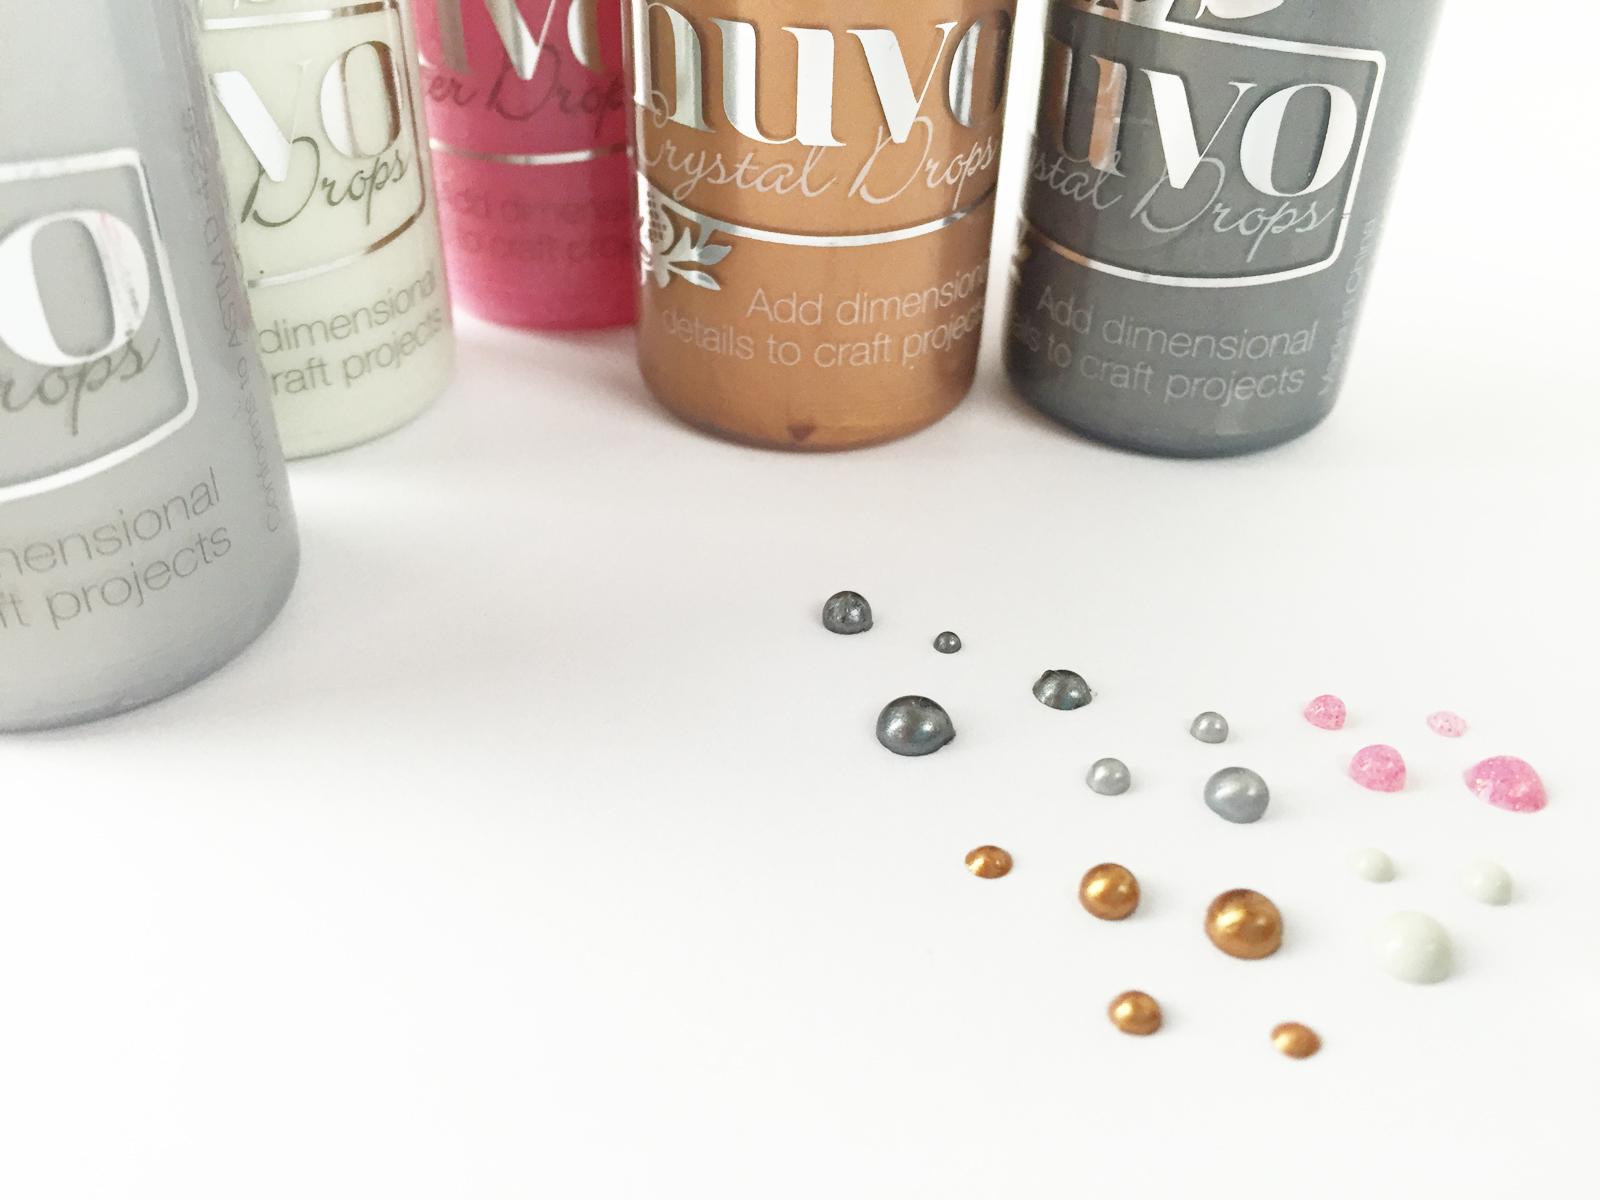 Nuvo Crystal Drops에 대한 이미지 검색결과